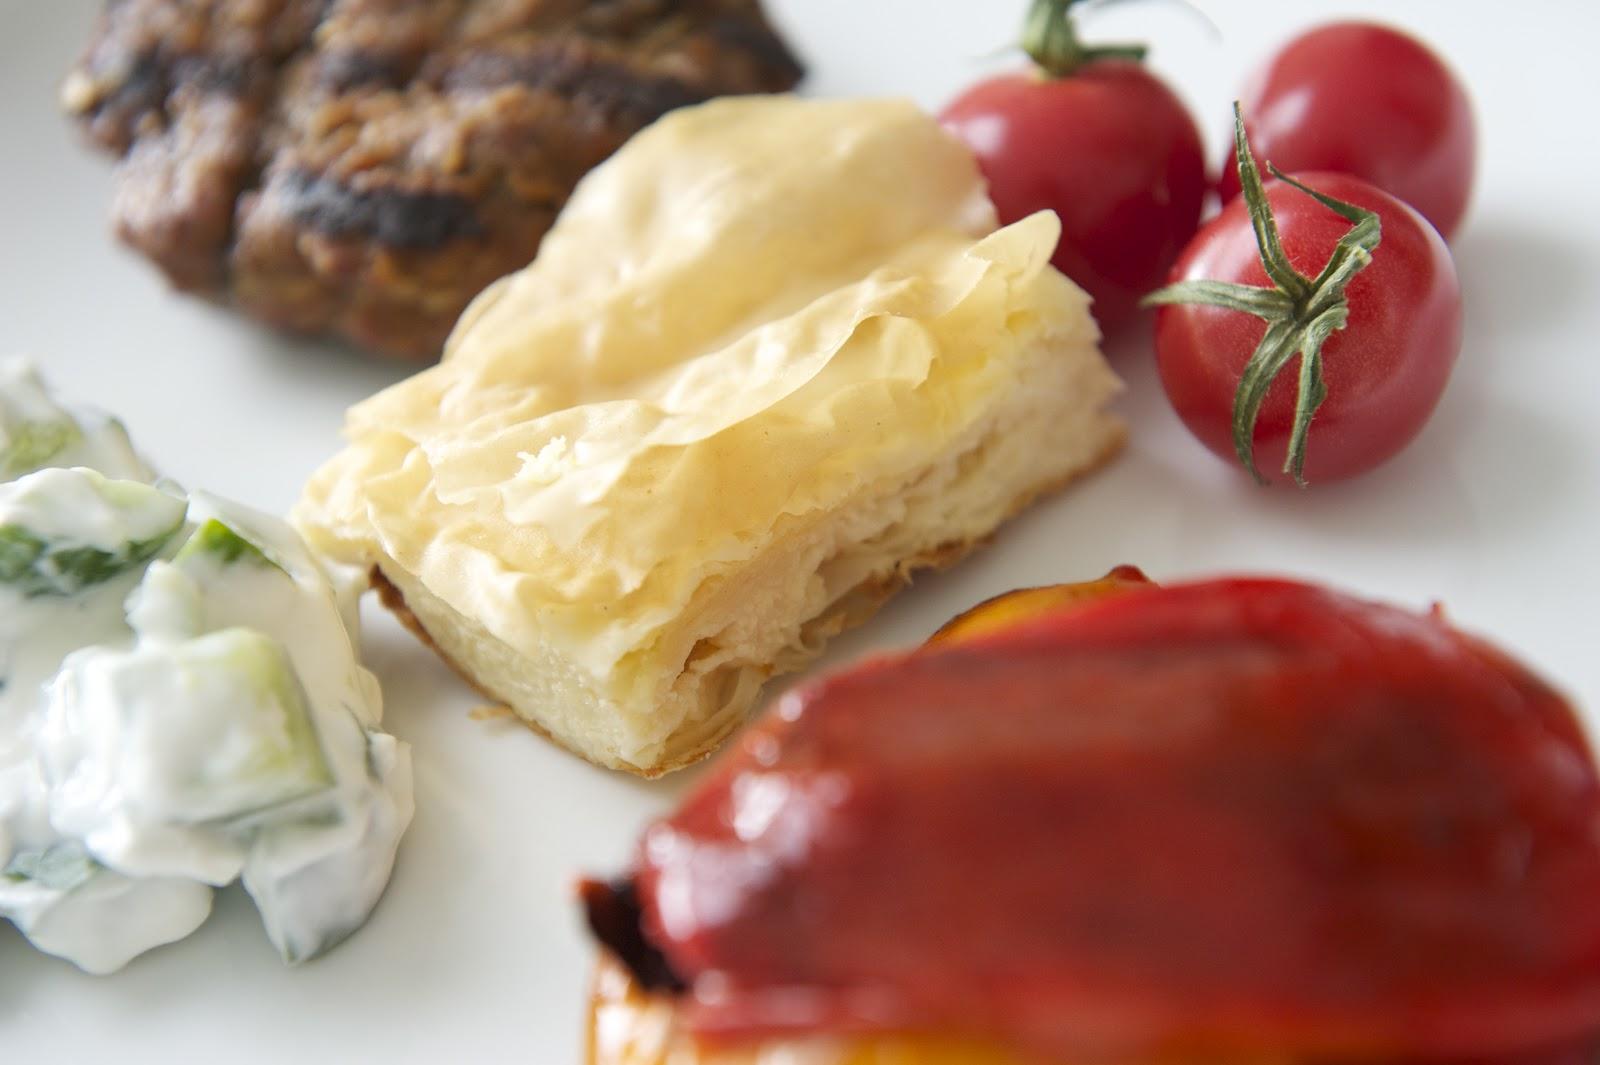 CAKE ON THE BRAIN: PLJESKAVICA (GF) AND GIBANICA (CROATIAN MEAT